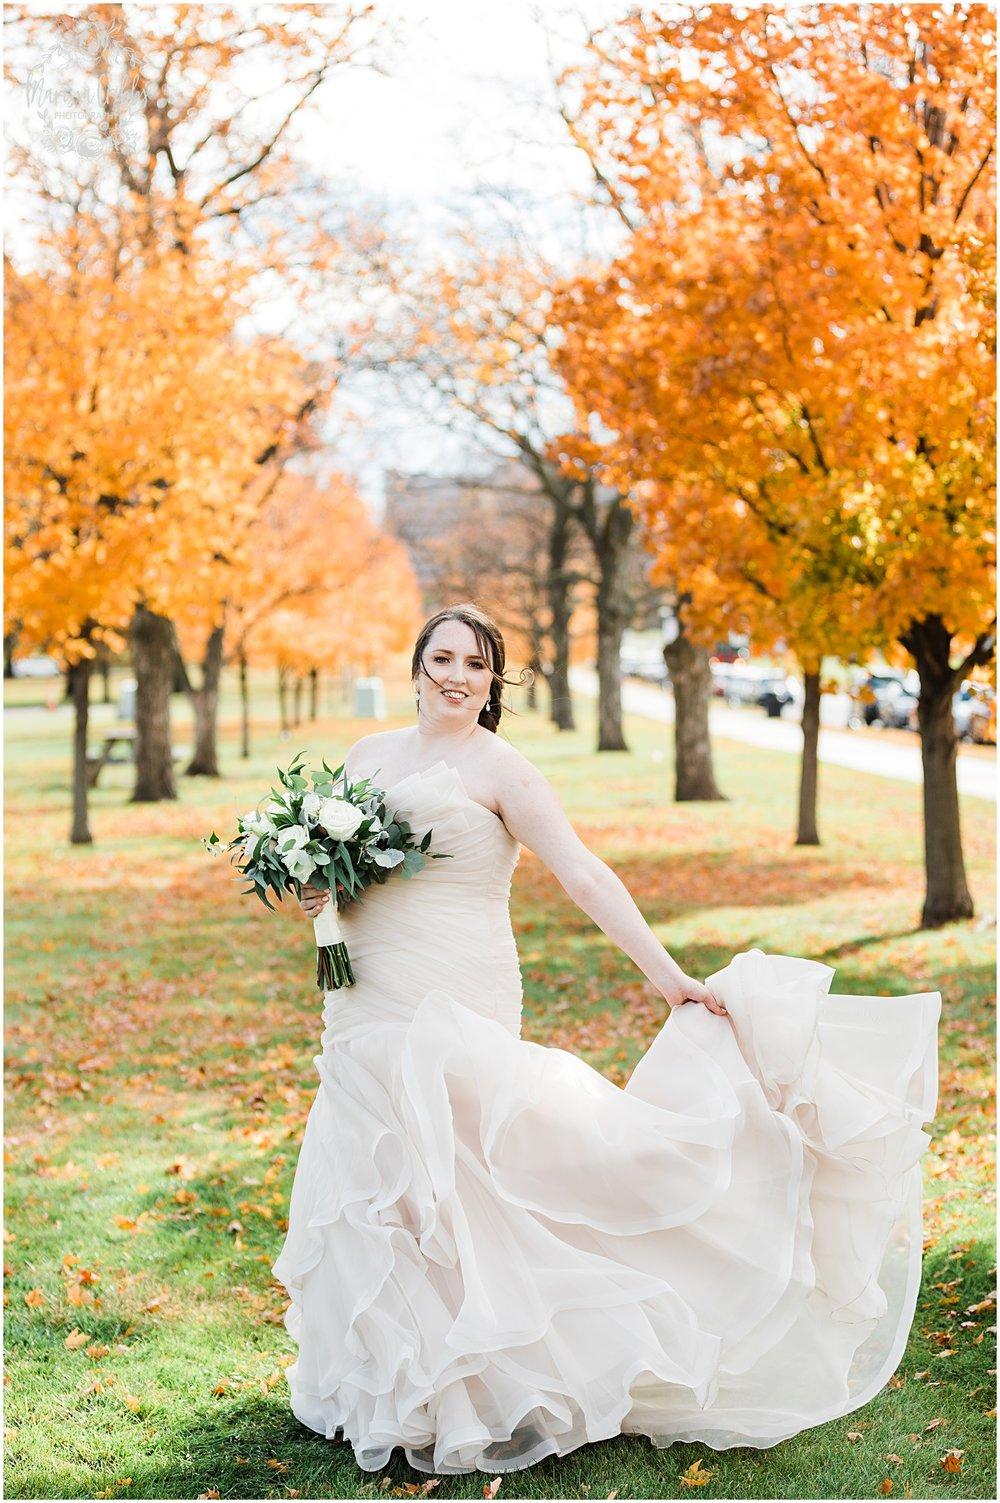 JULIA & AUSTIN MADRID THEATRE WEDDING | MARISSA CRIBBS PHOTOGRAPHY_7116.jpg